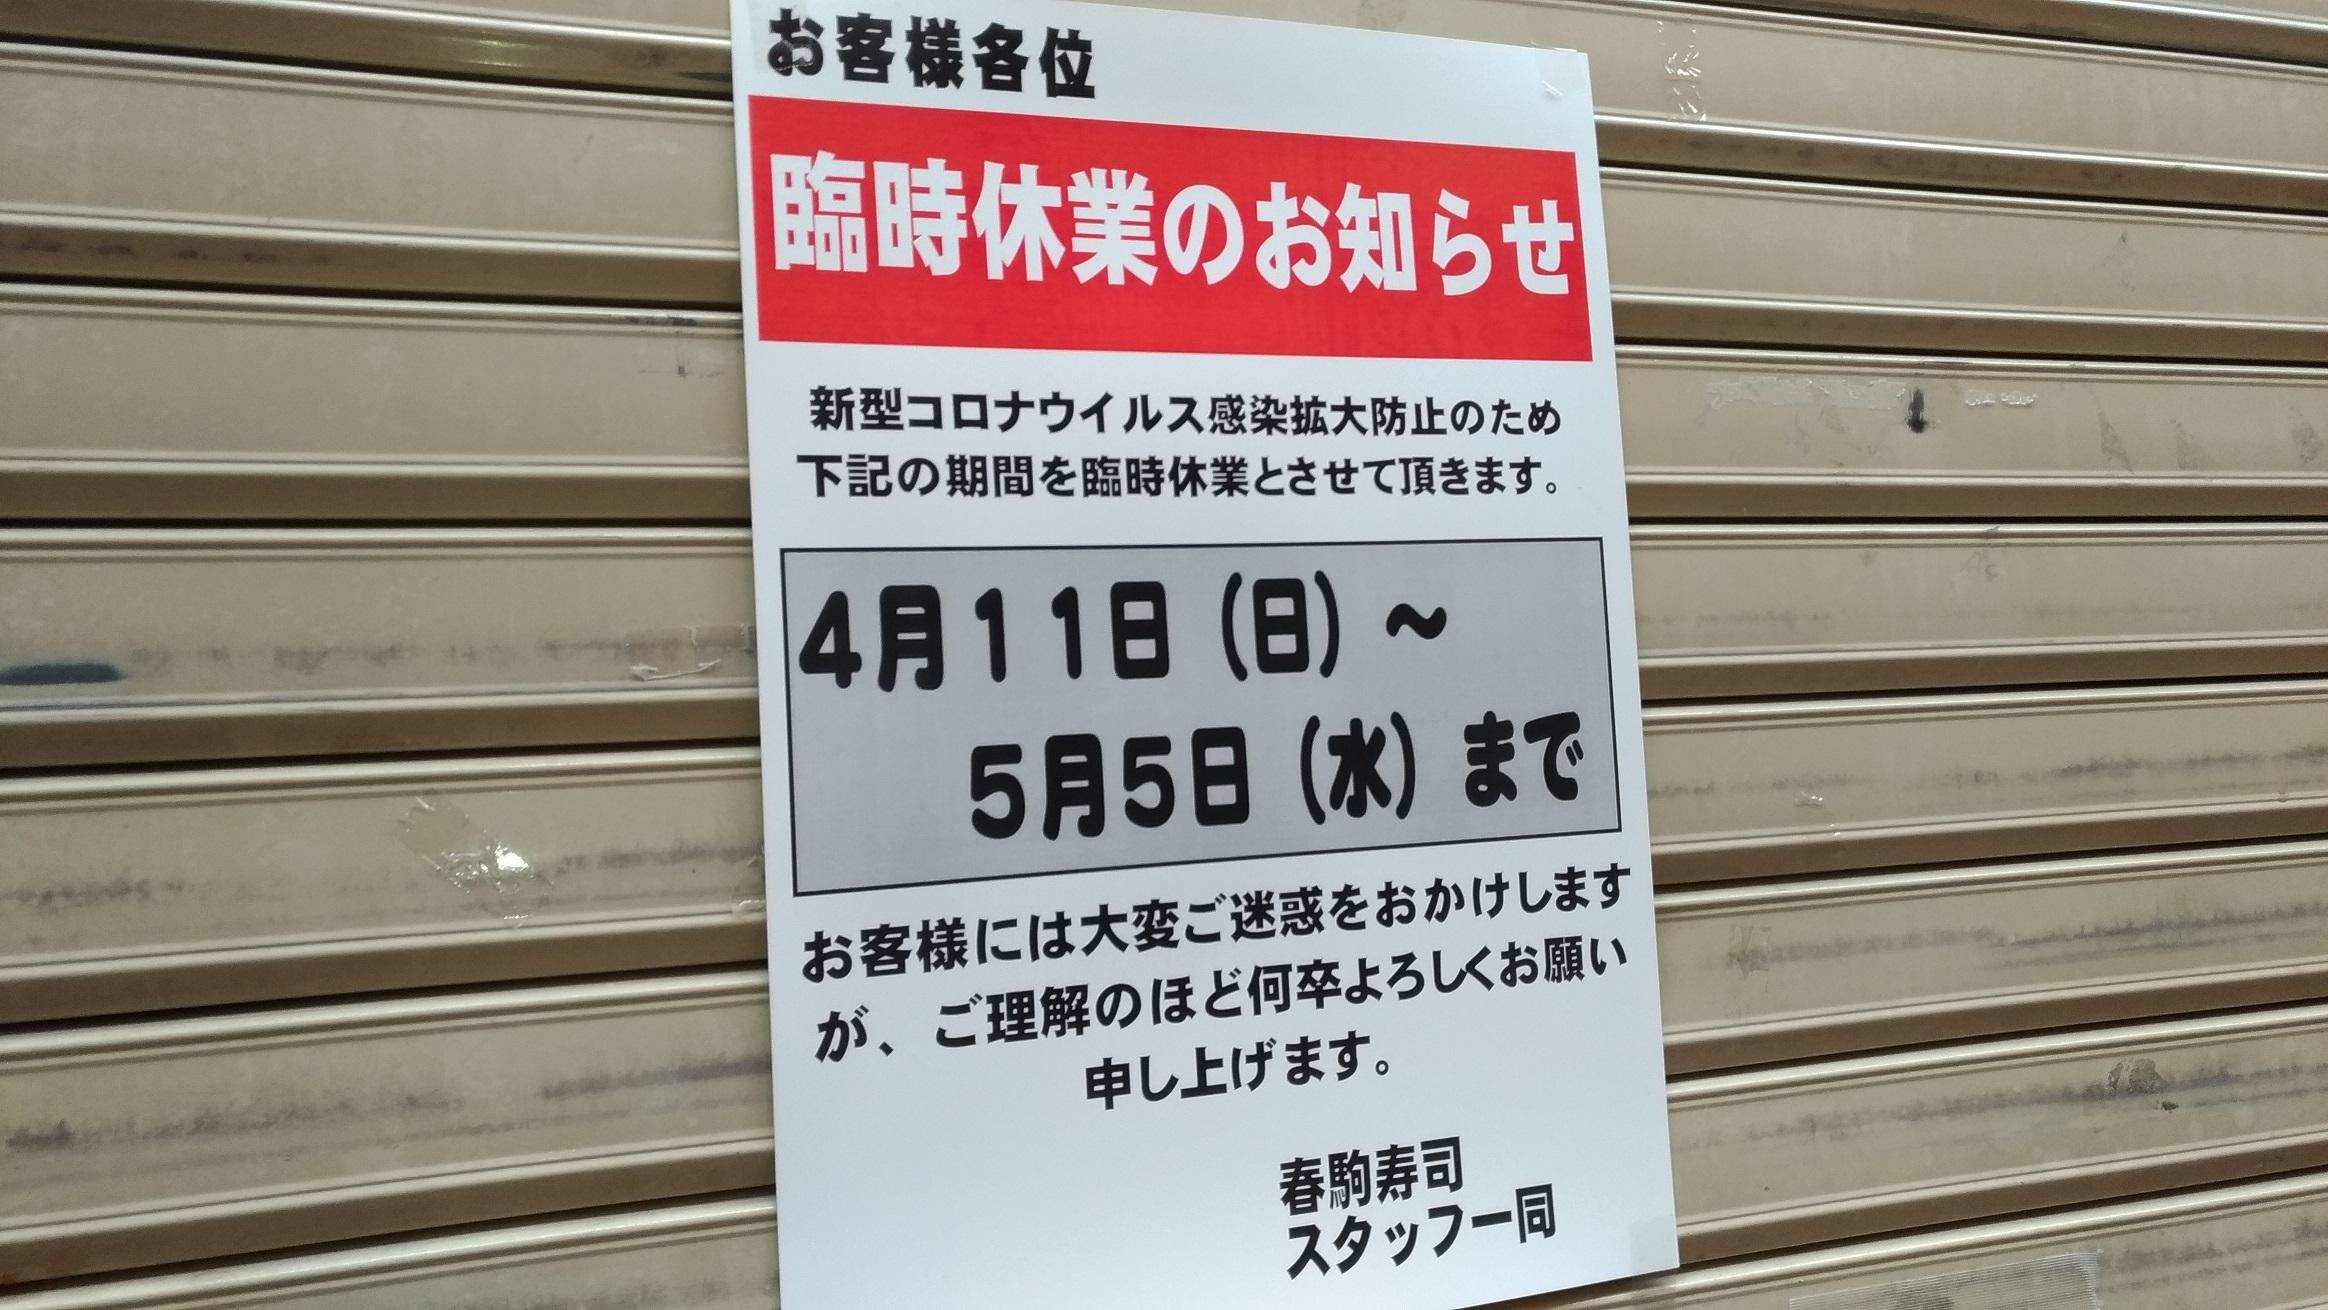 harukoma_sushi_tenma_0423_2021_.jpg